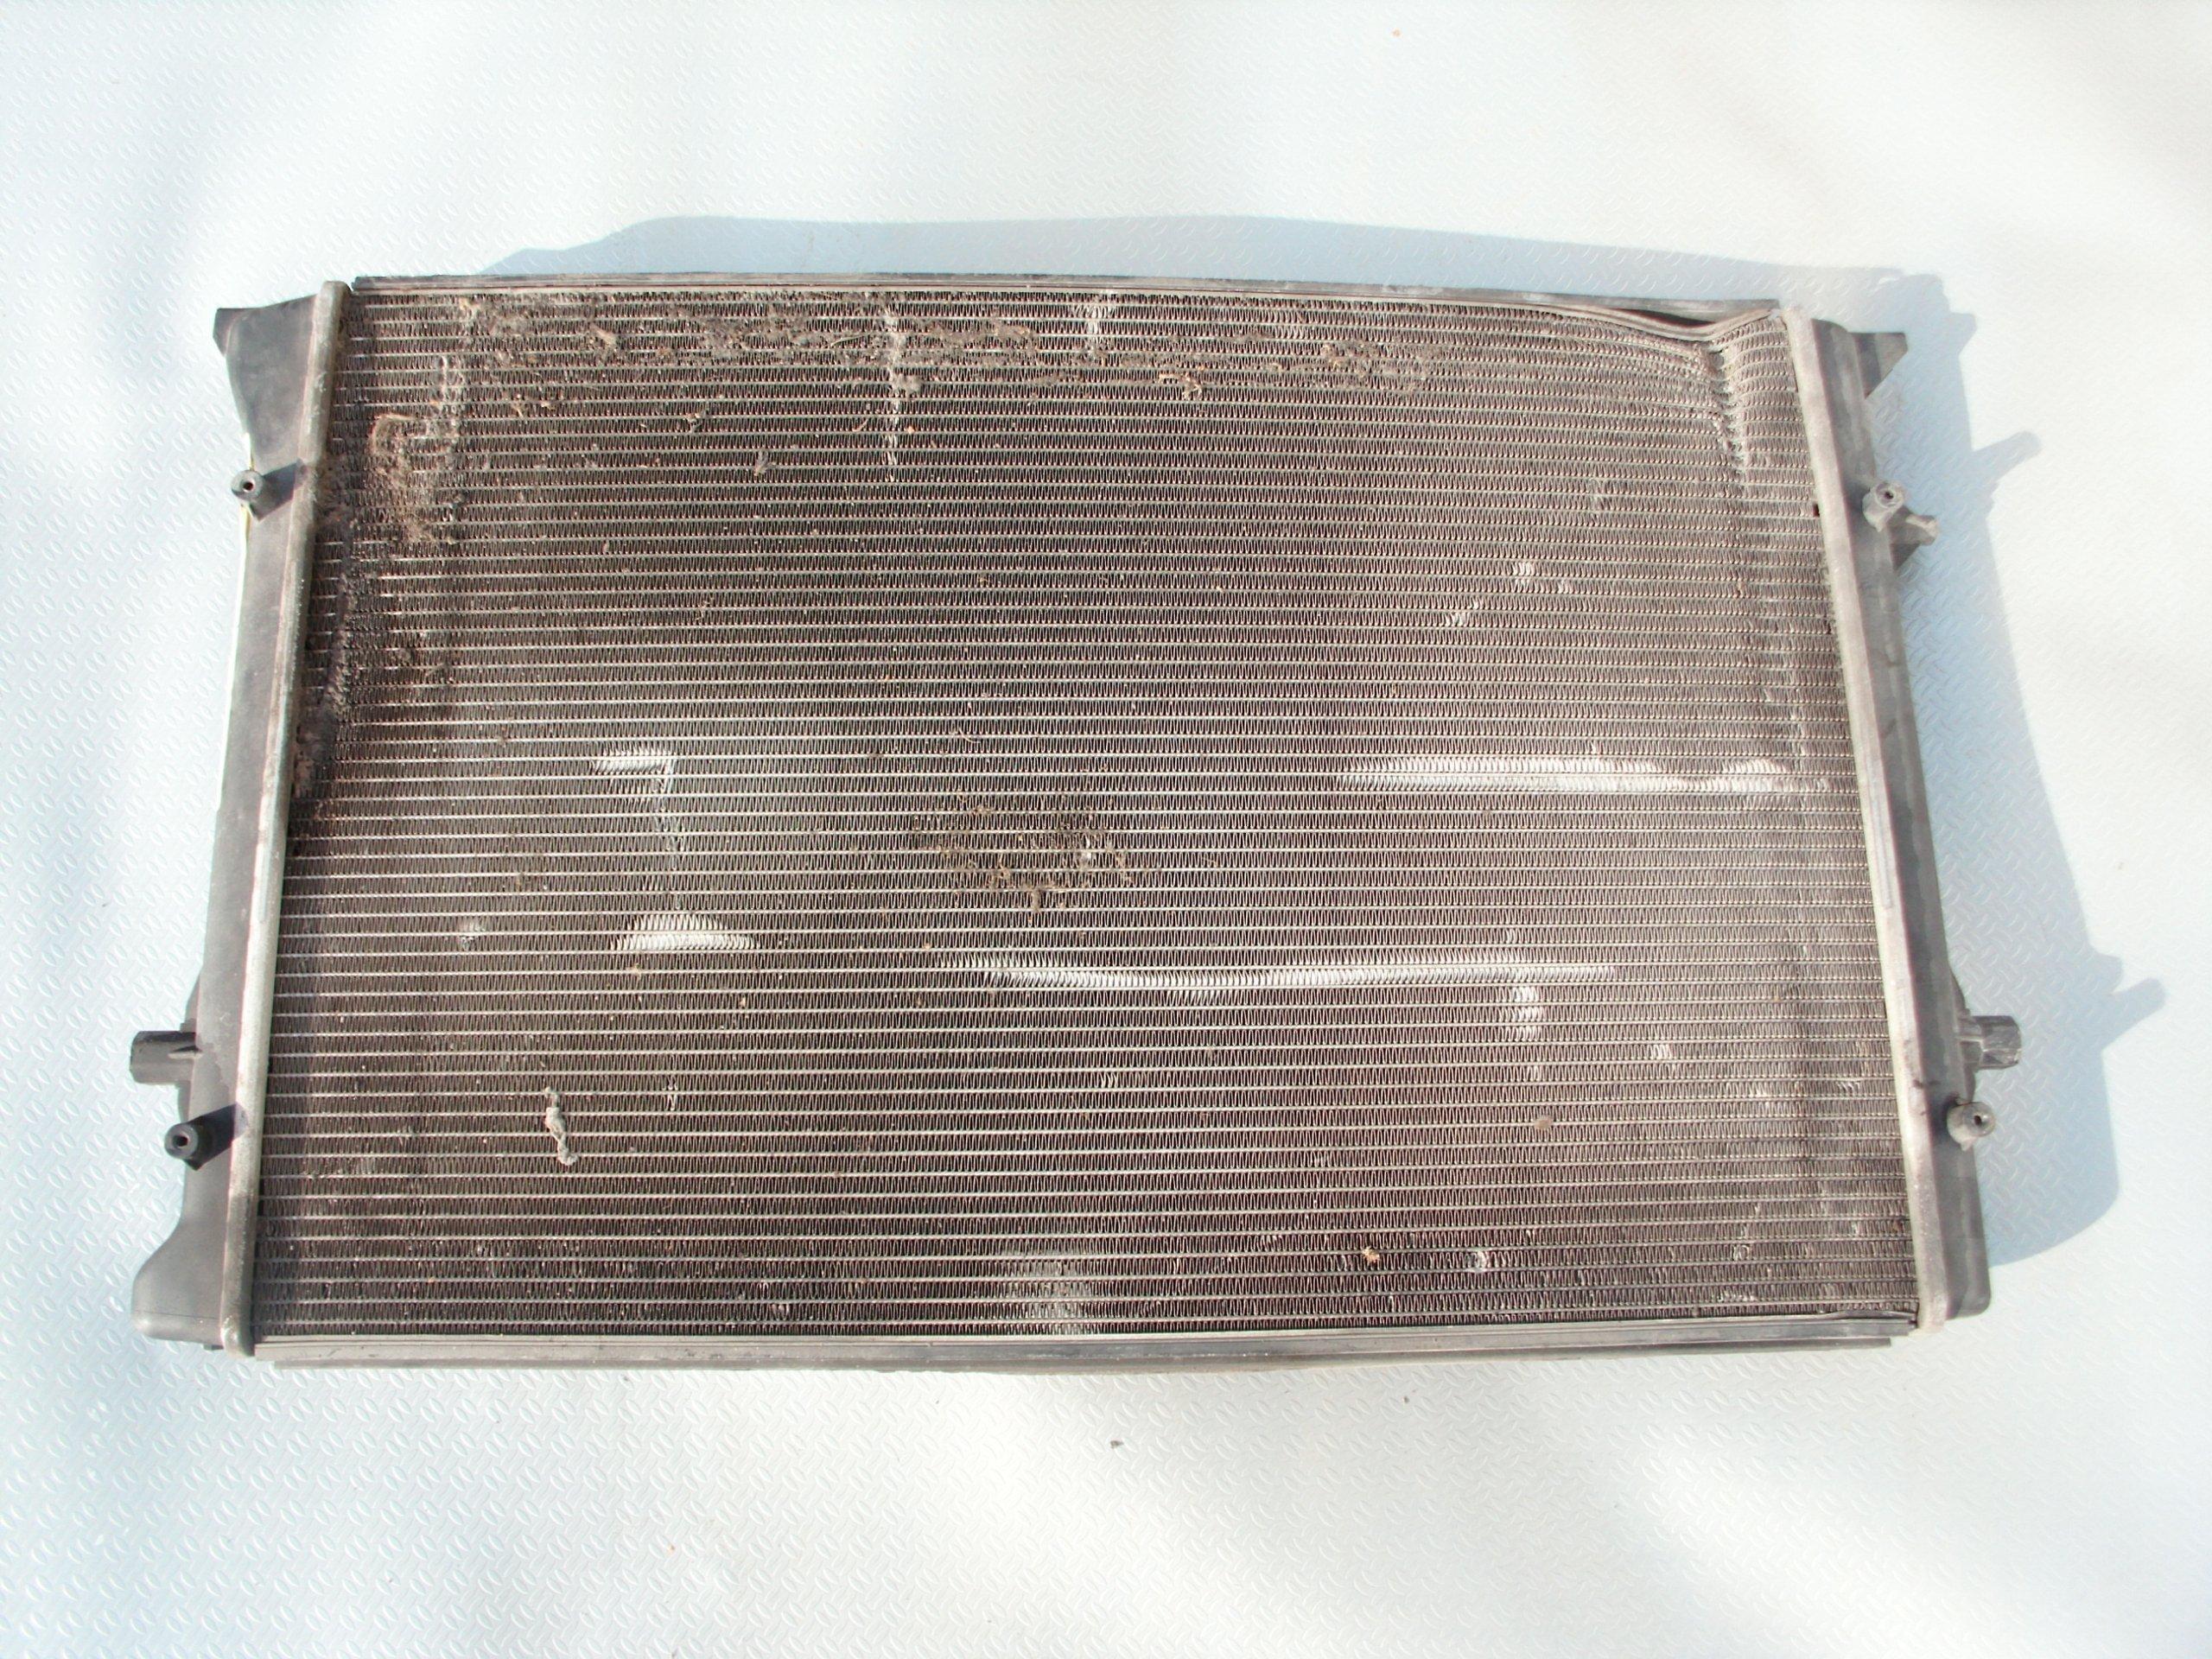 CHŁODNICA WODY 3.2 V6 AUDI VW 1K0121251K